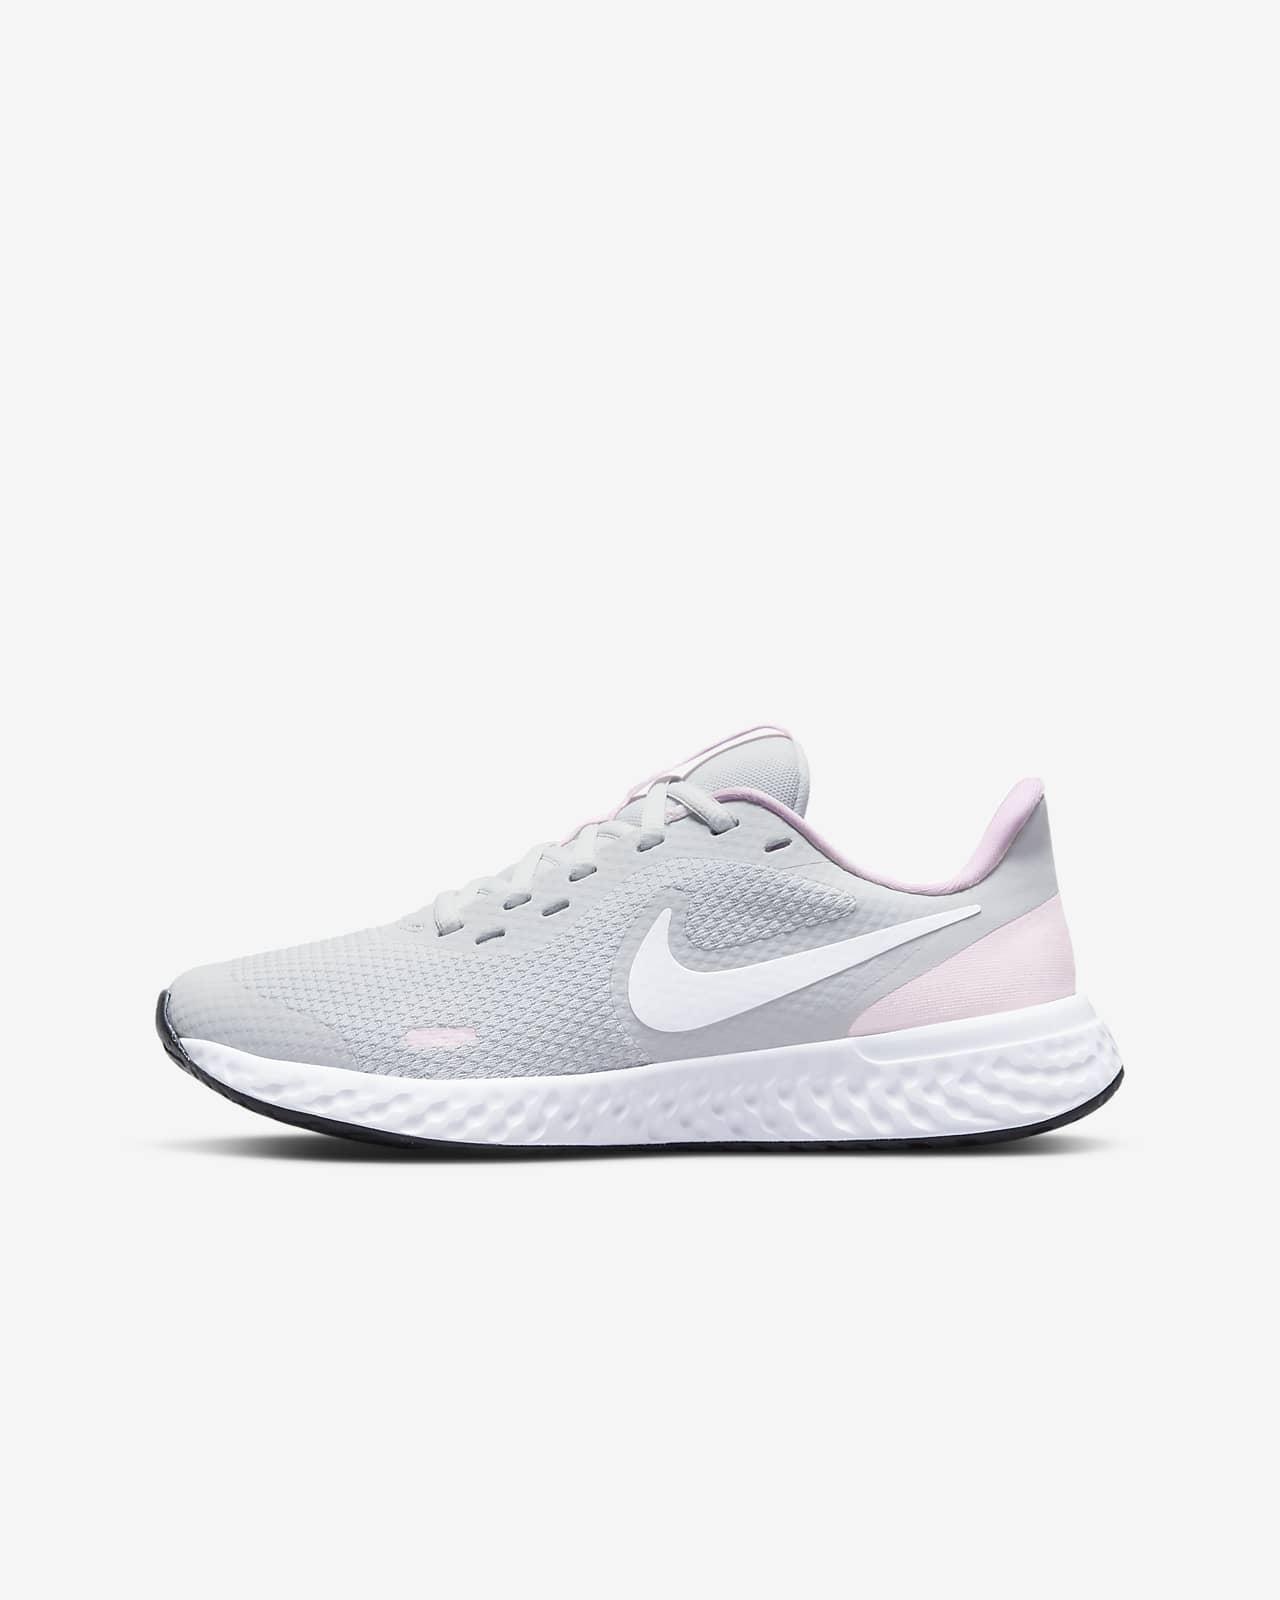 Calzado de running para niños talla grande Nike Revolution 5